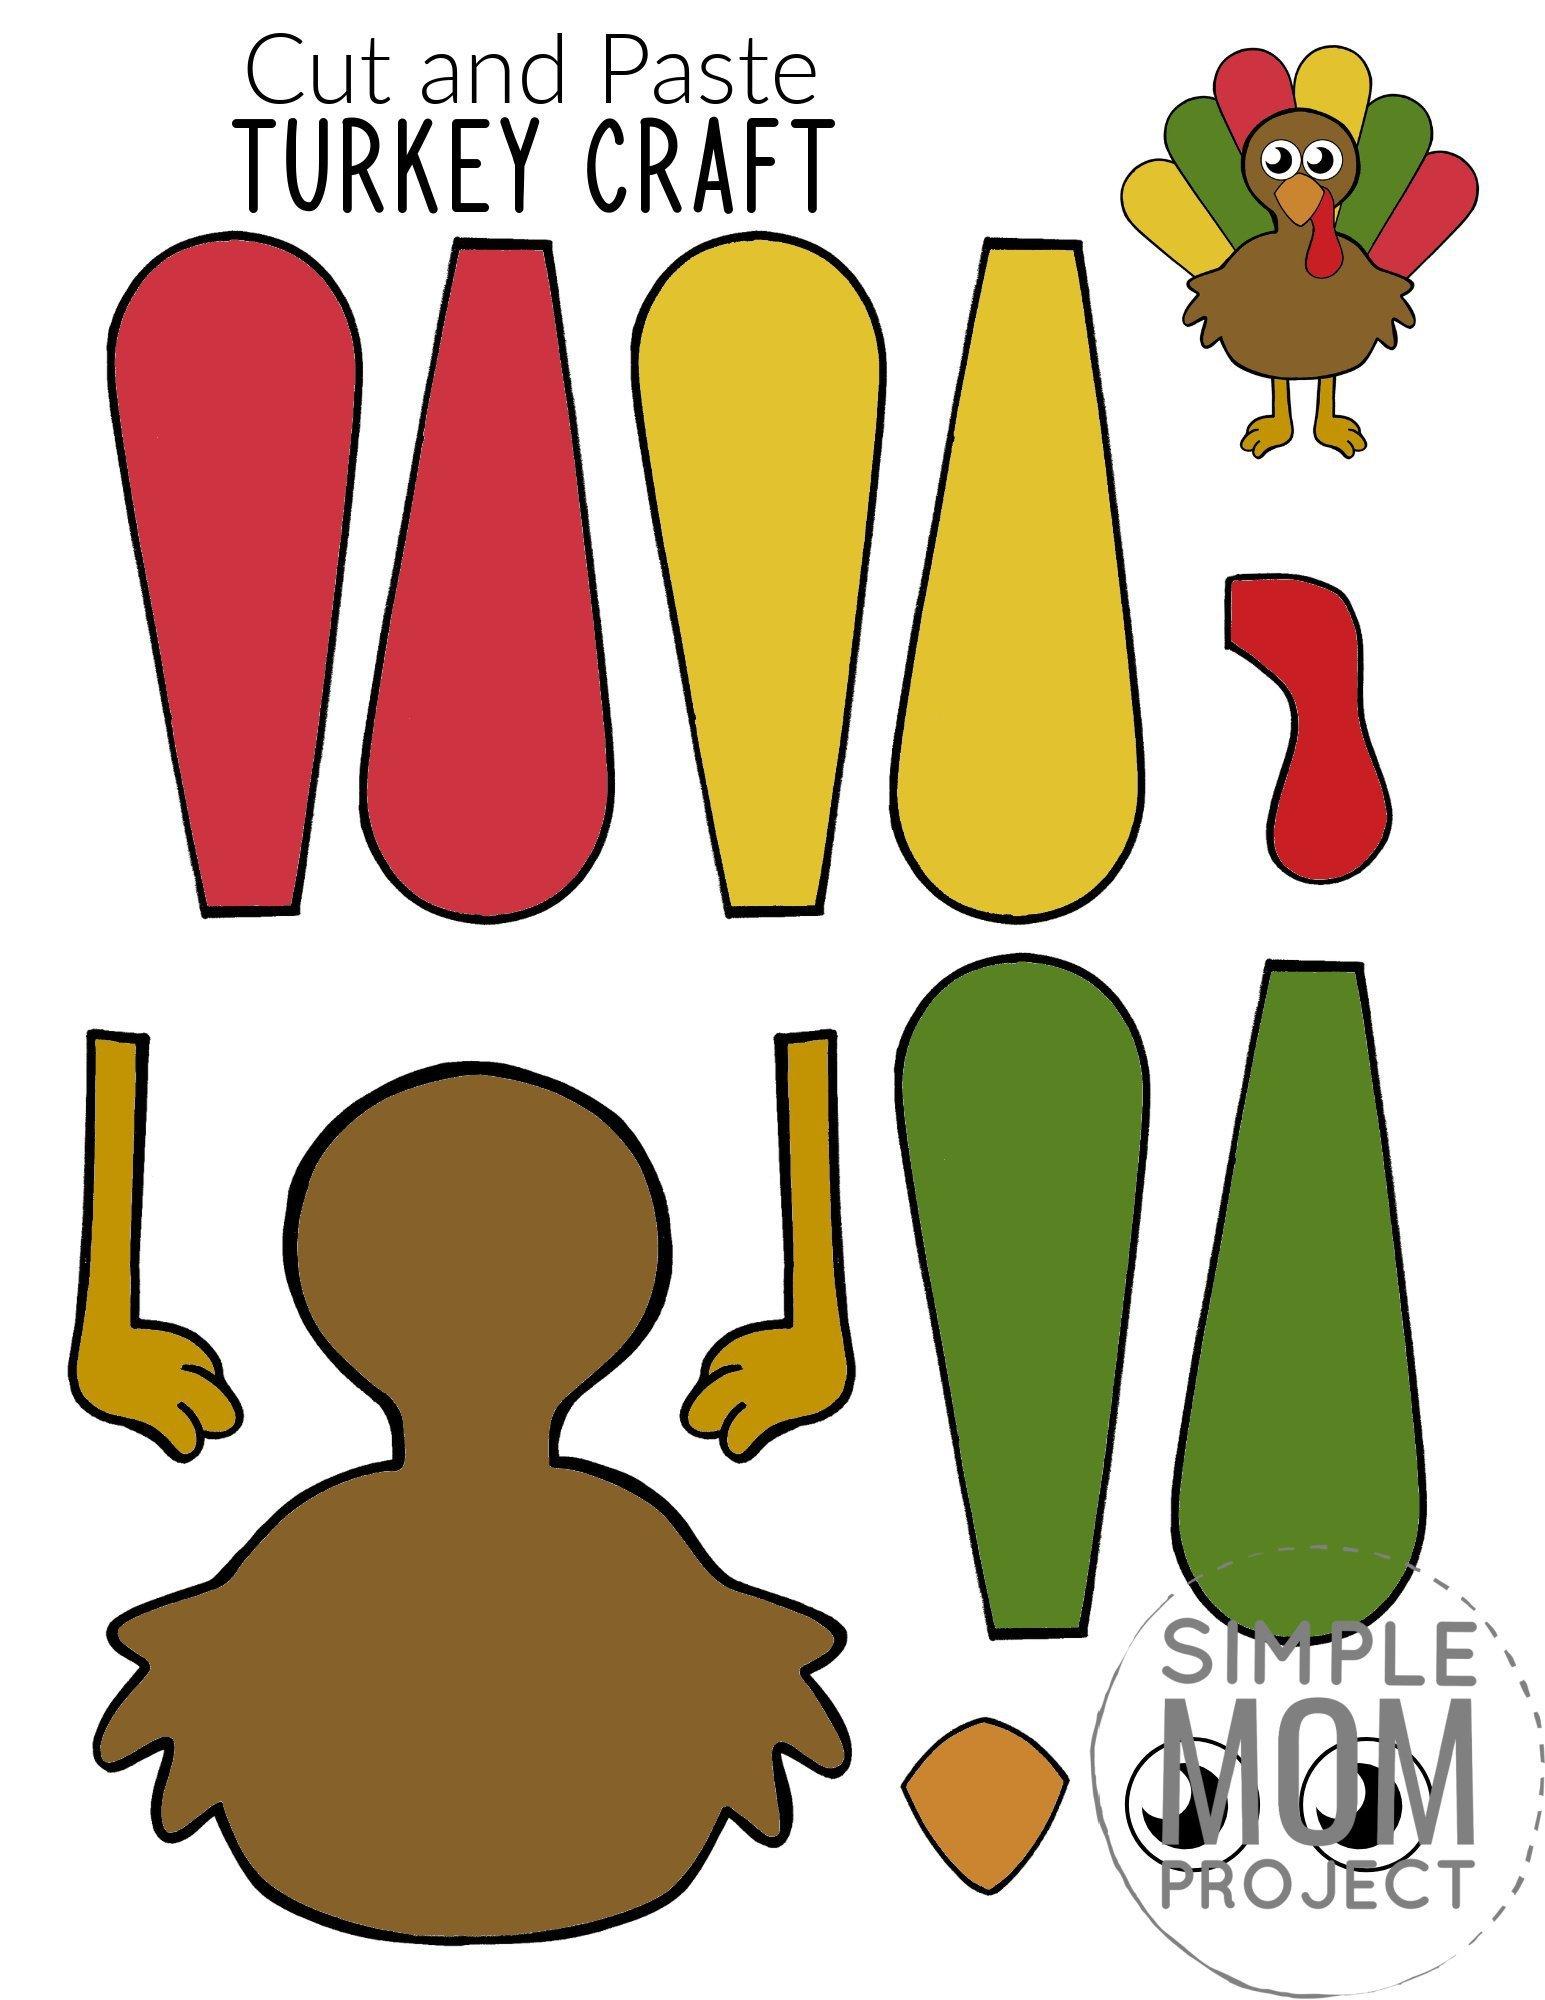 Printable Turkey Craft for Kids, preschoolers toddlers and kindergartners